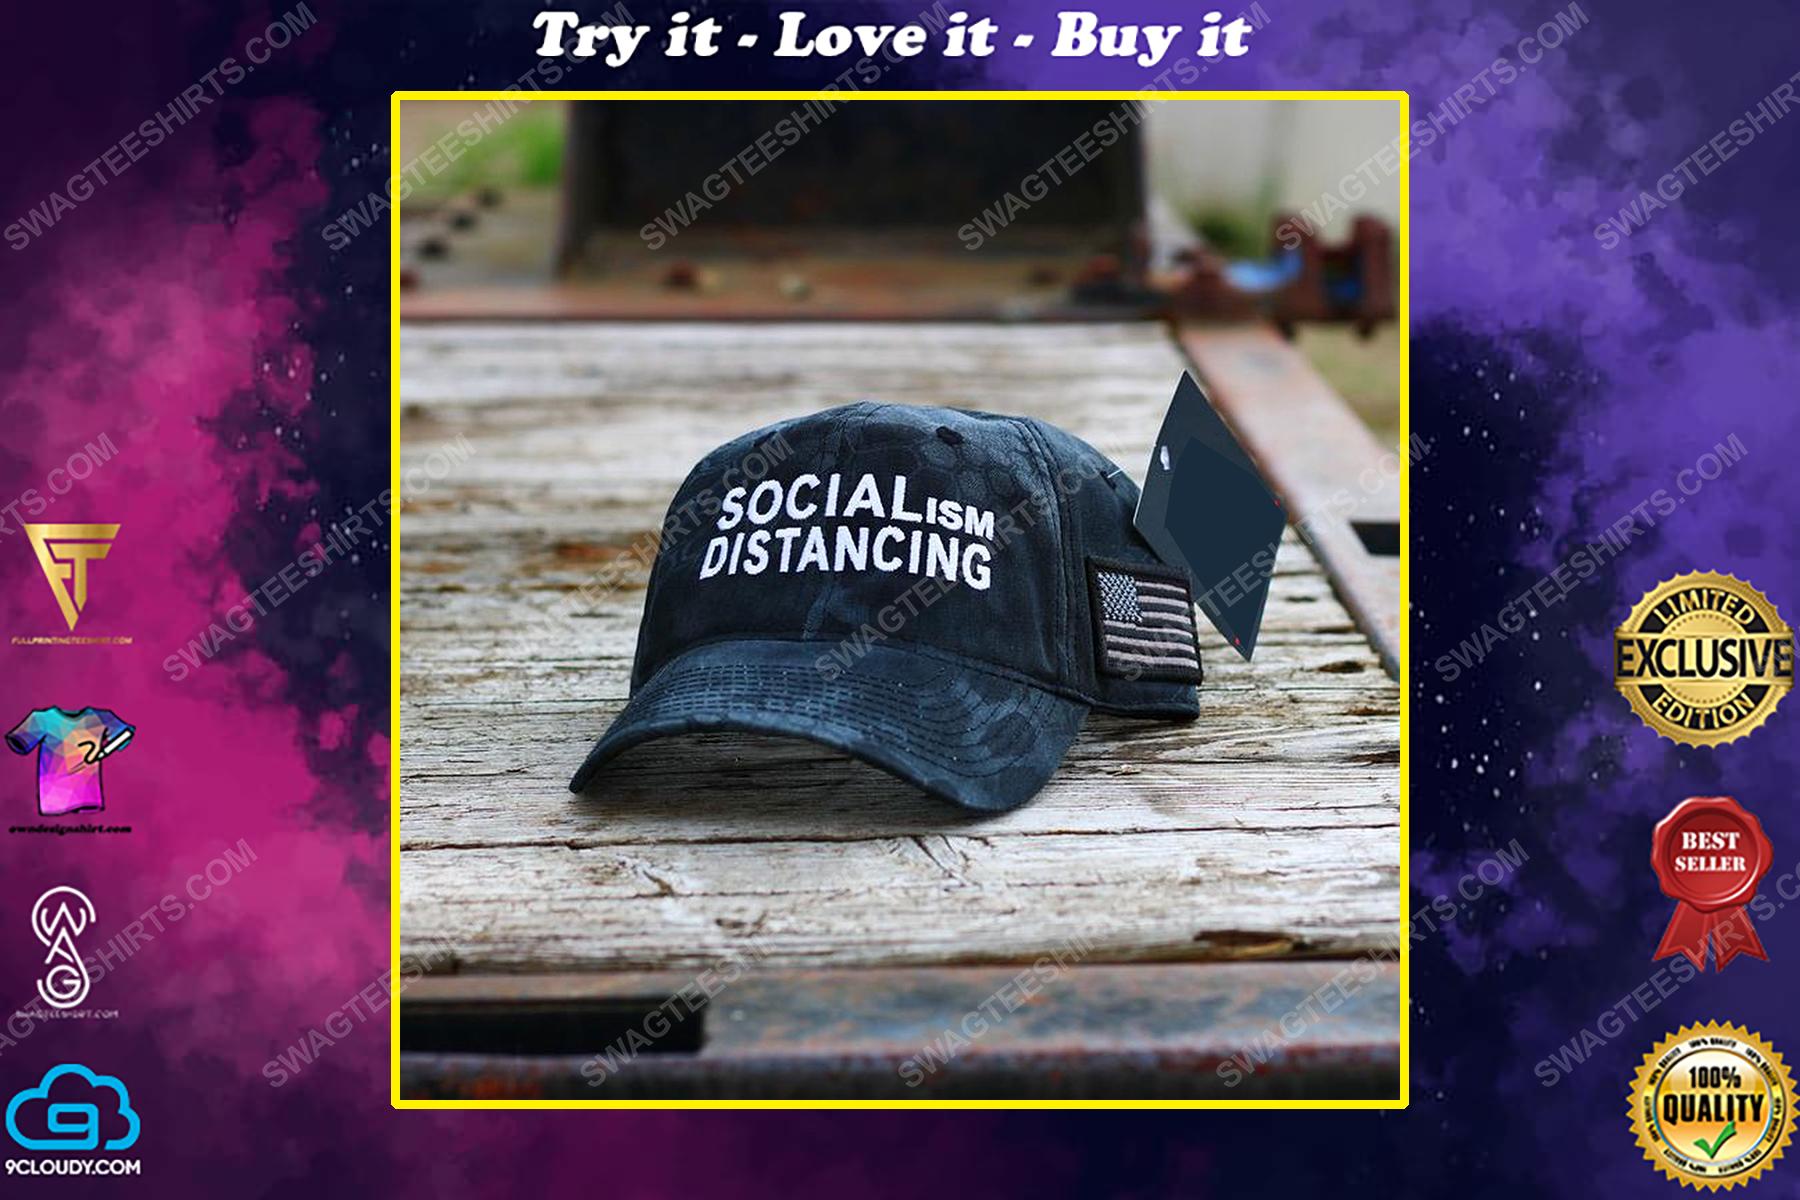 Socialism distancing full print classic hat